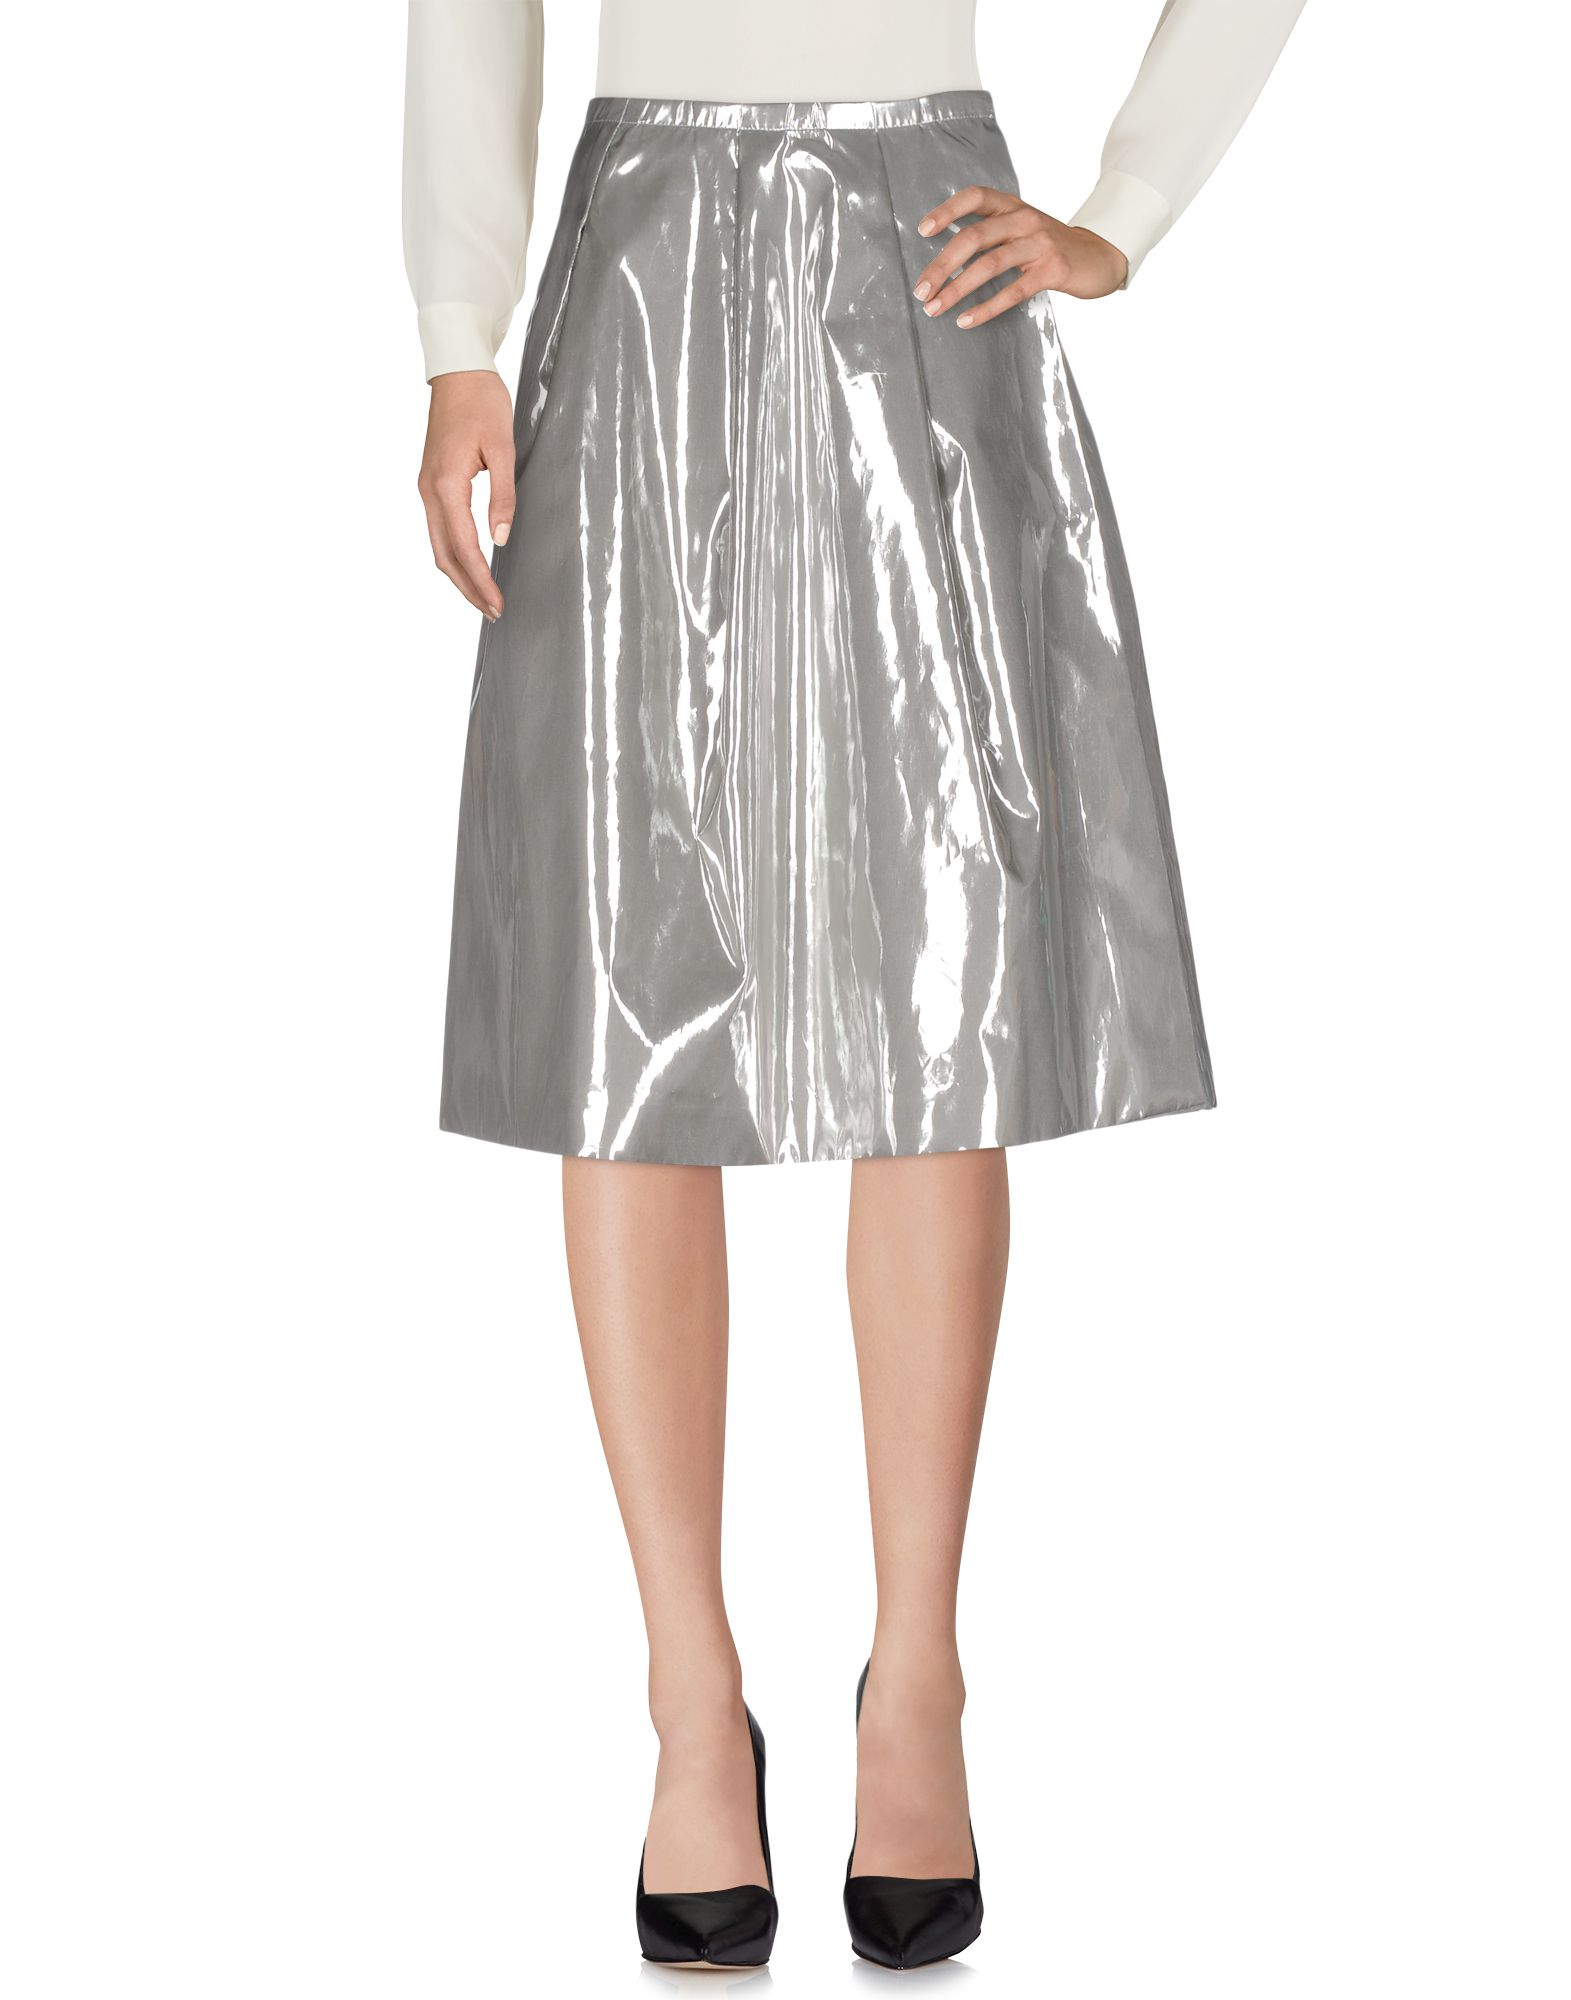 ARTHUR ARBESSER Midi Skirts in Silver